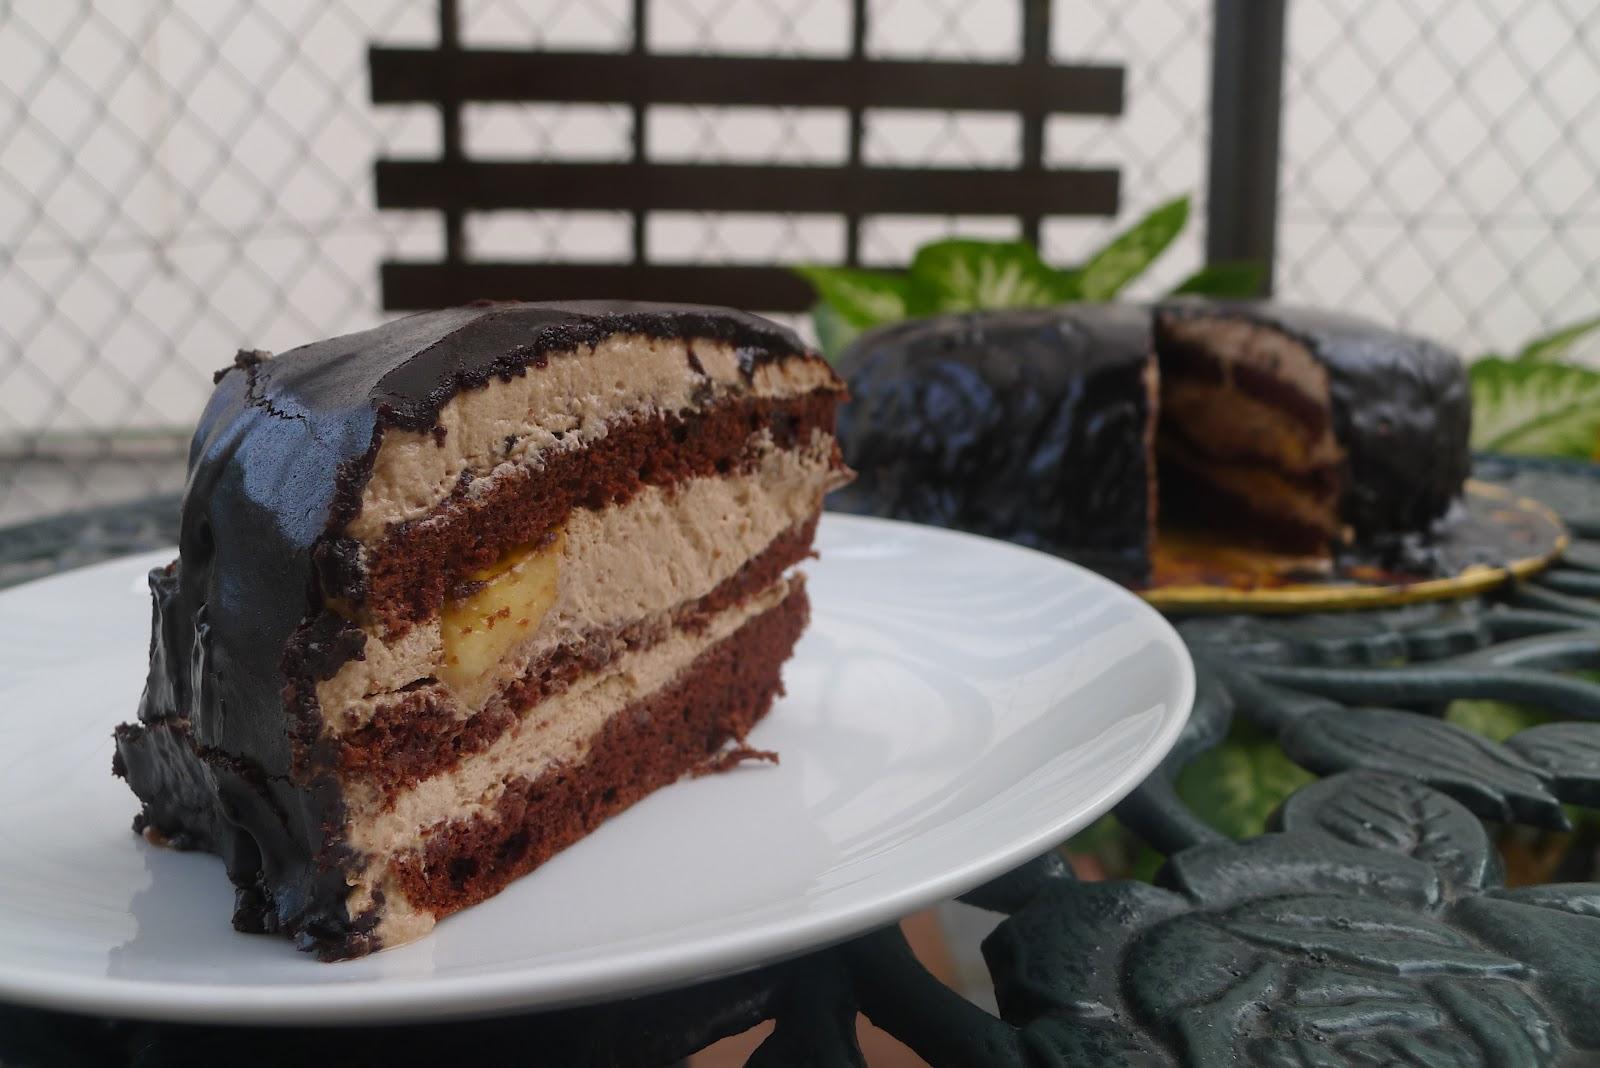 Banana Cake Recipe Chocolate Icing: 32 Degree Celsius: Chocolate Banana Cake (Secret Recipe